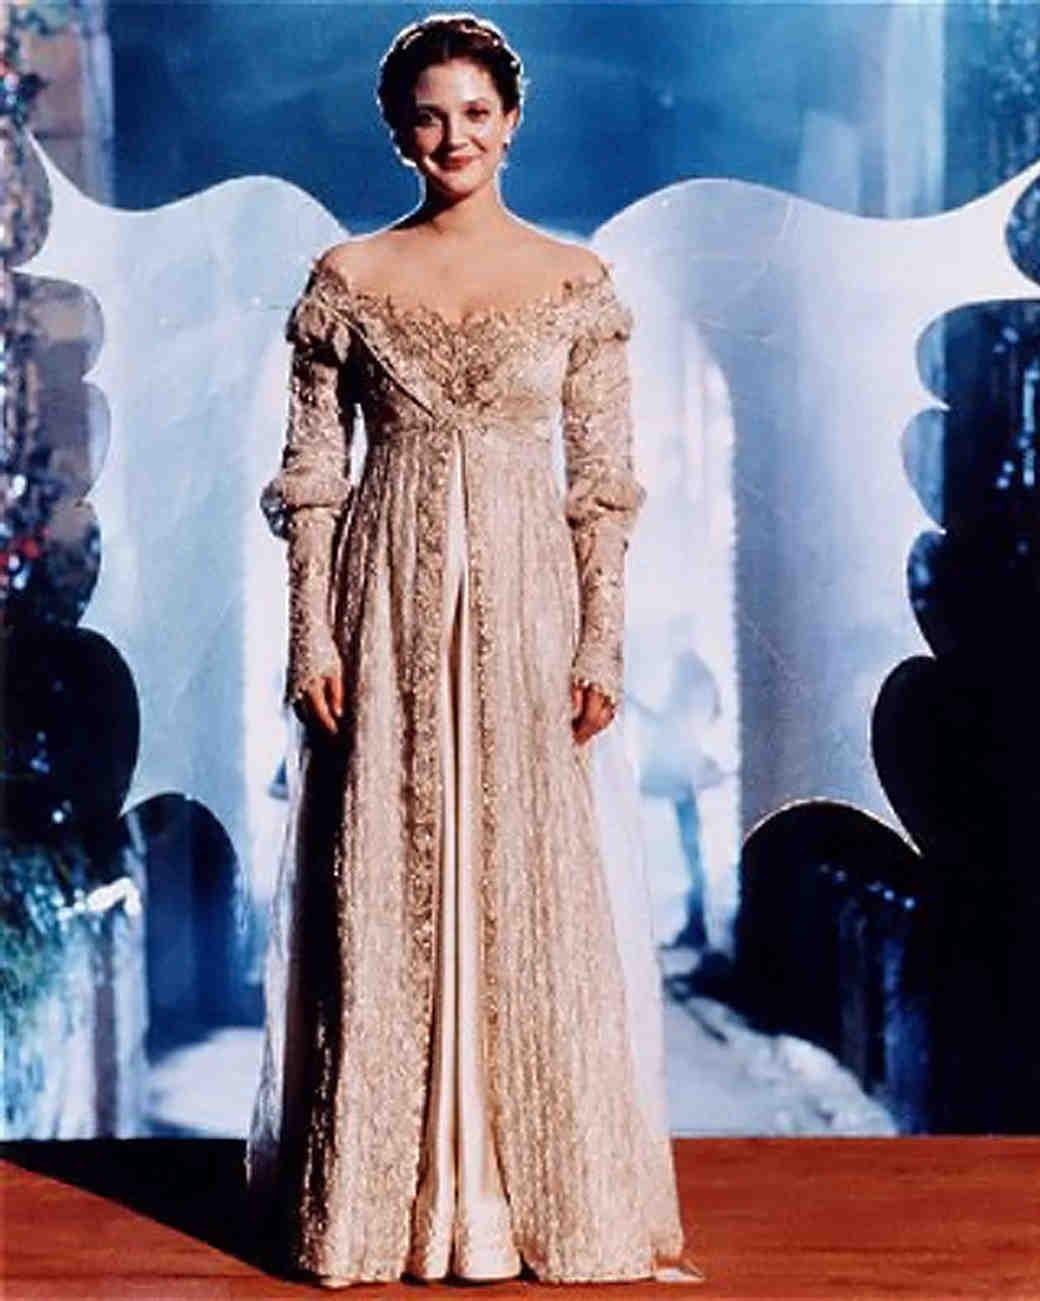 movie-wedding-dresses-ever-after-drew-barrymore-0316.jpg